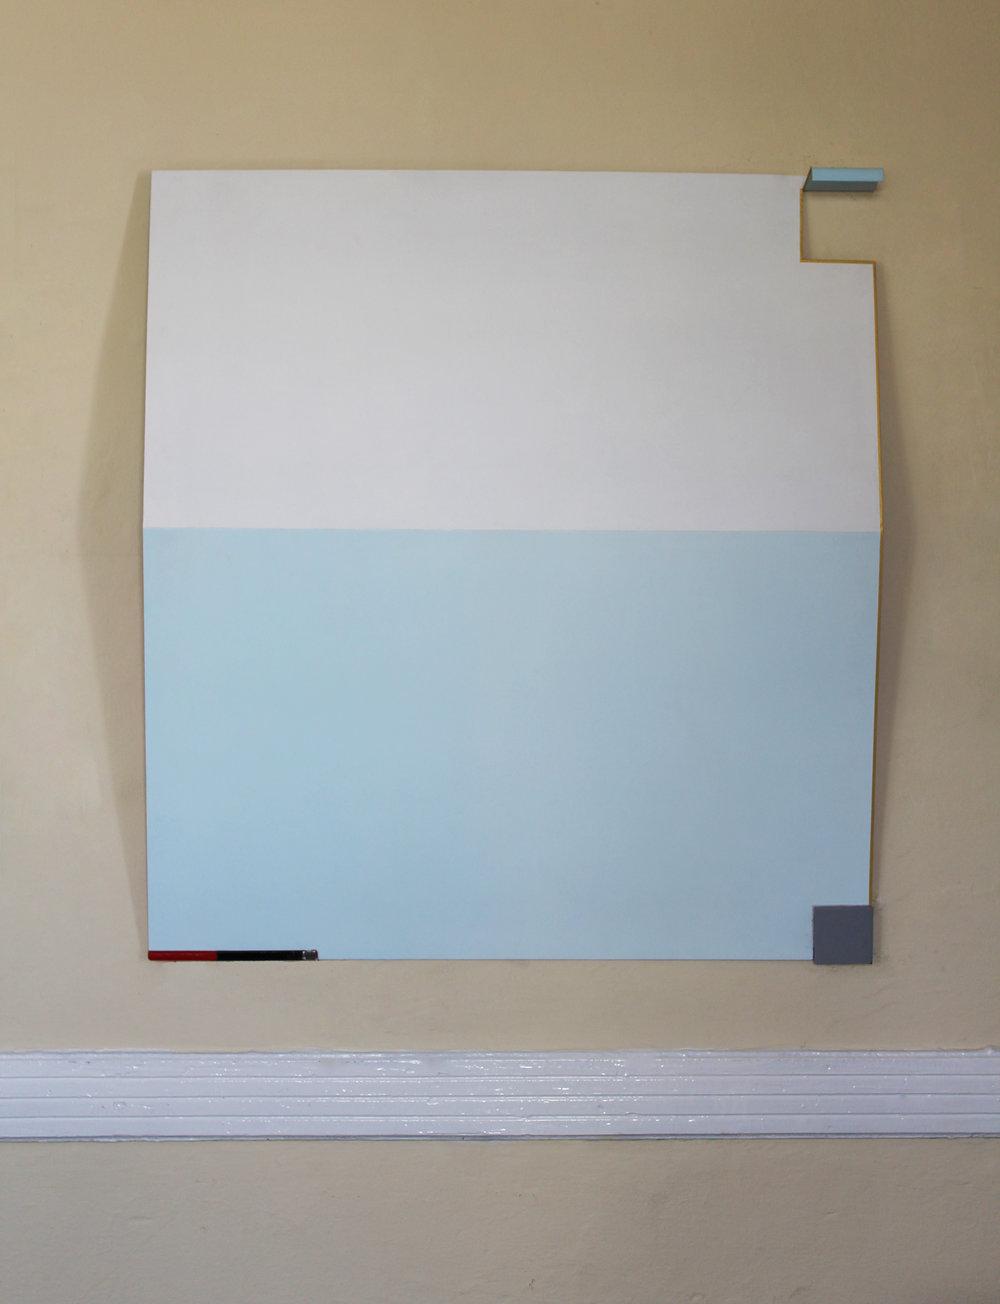 Pavlos Nikolakopoulos,  No Big Deal , 2015, Acrylic and epoxy color on metal sheet, 110 x 100 cm